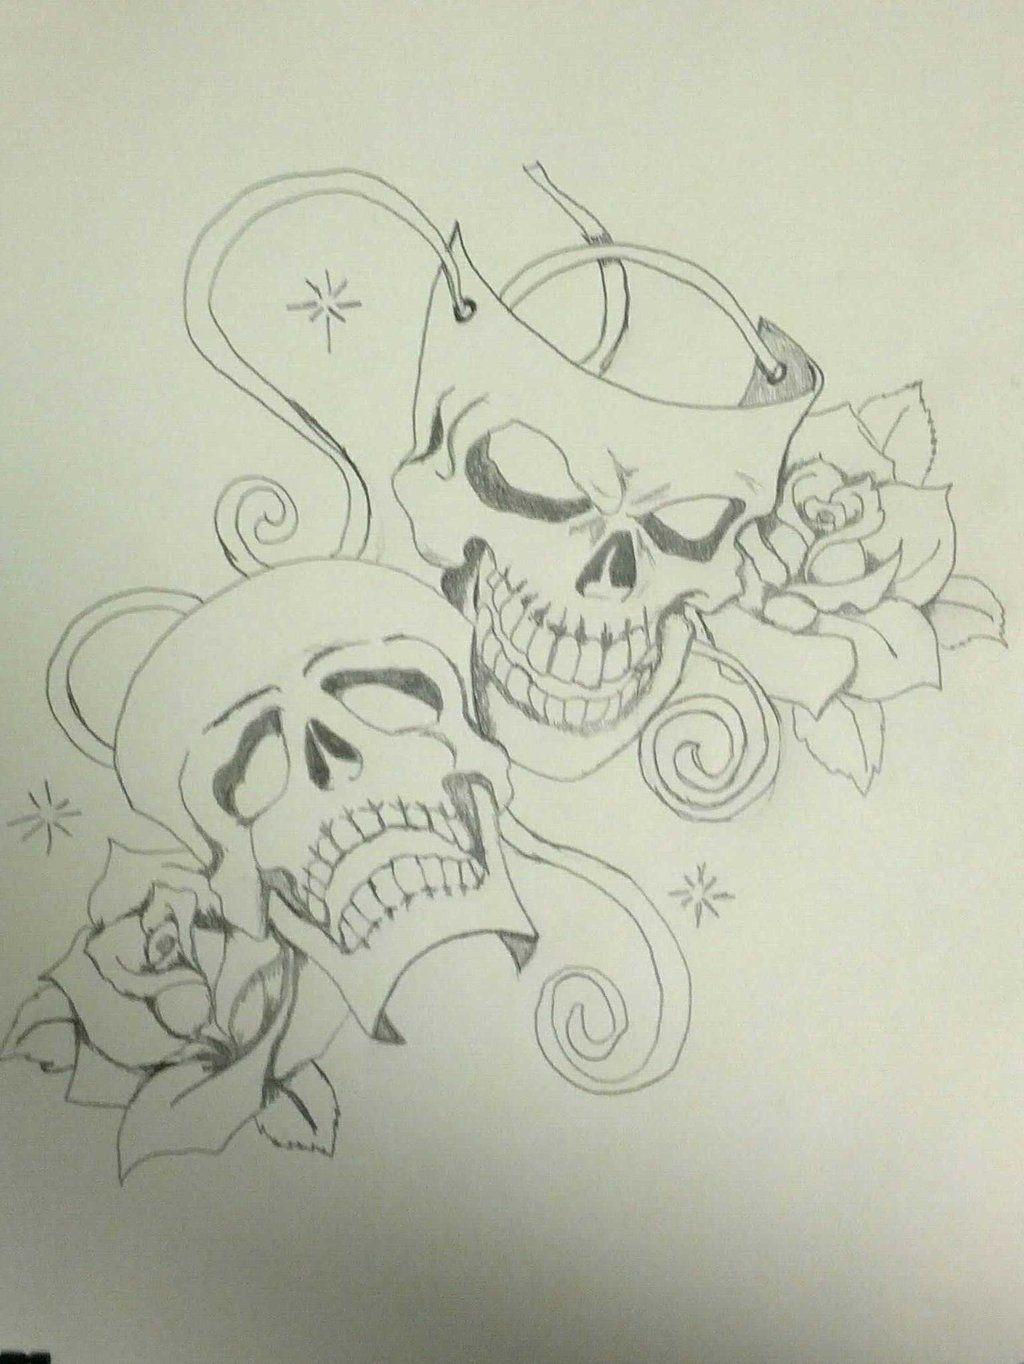 Happy and sad face masks happy and sad face tattoos - Pin Face Happy Sad Masks Tattoo On Pinterest